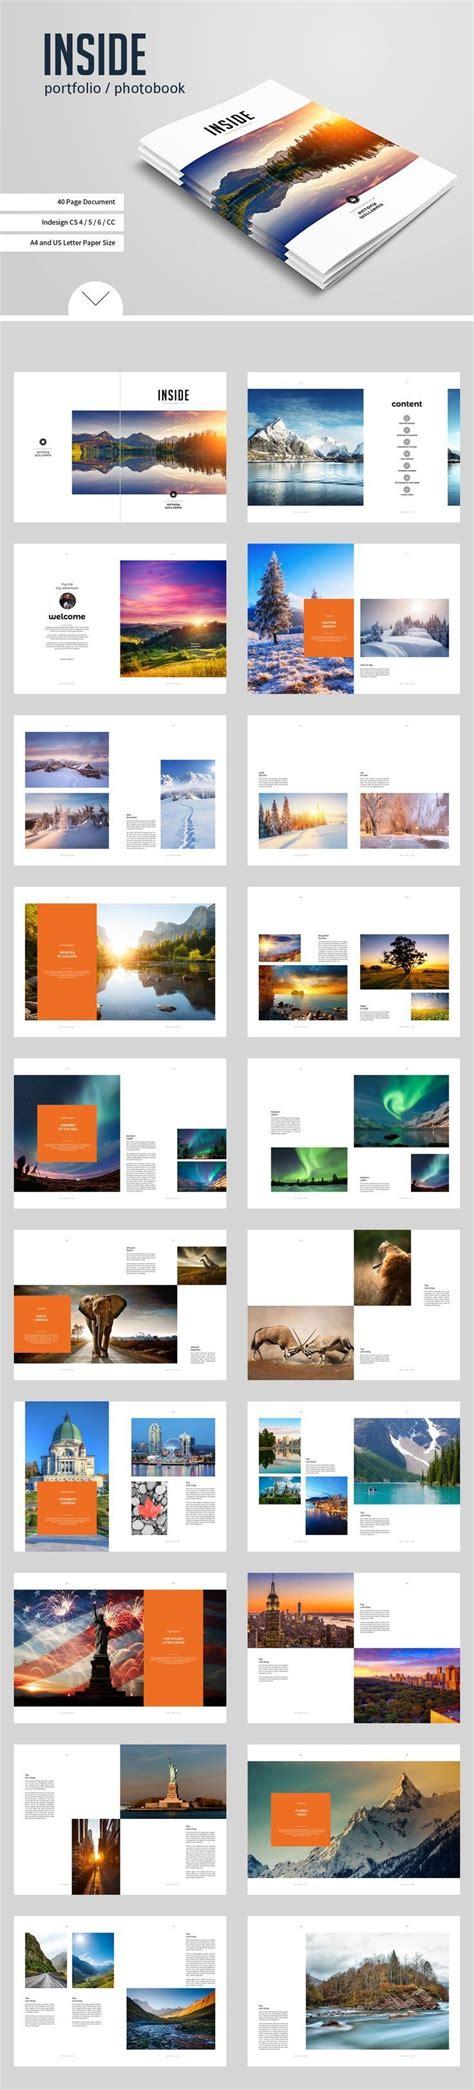 portfolio layout design download architecture portfolio layouts sles free download